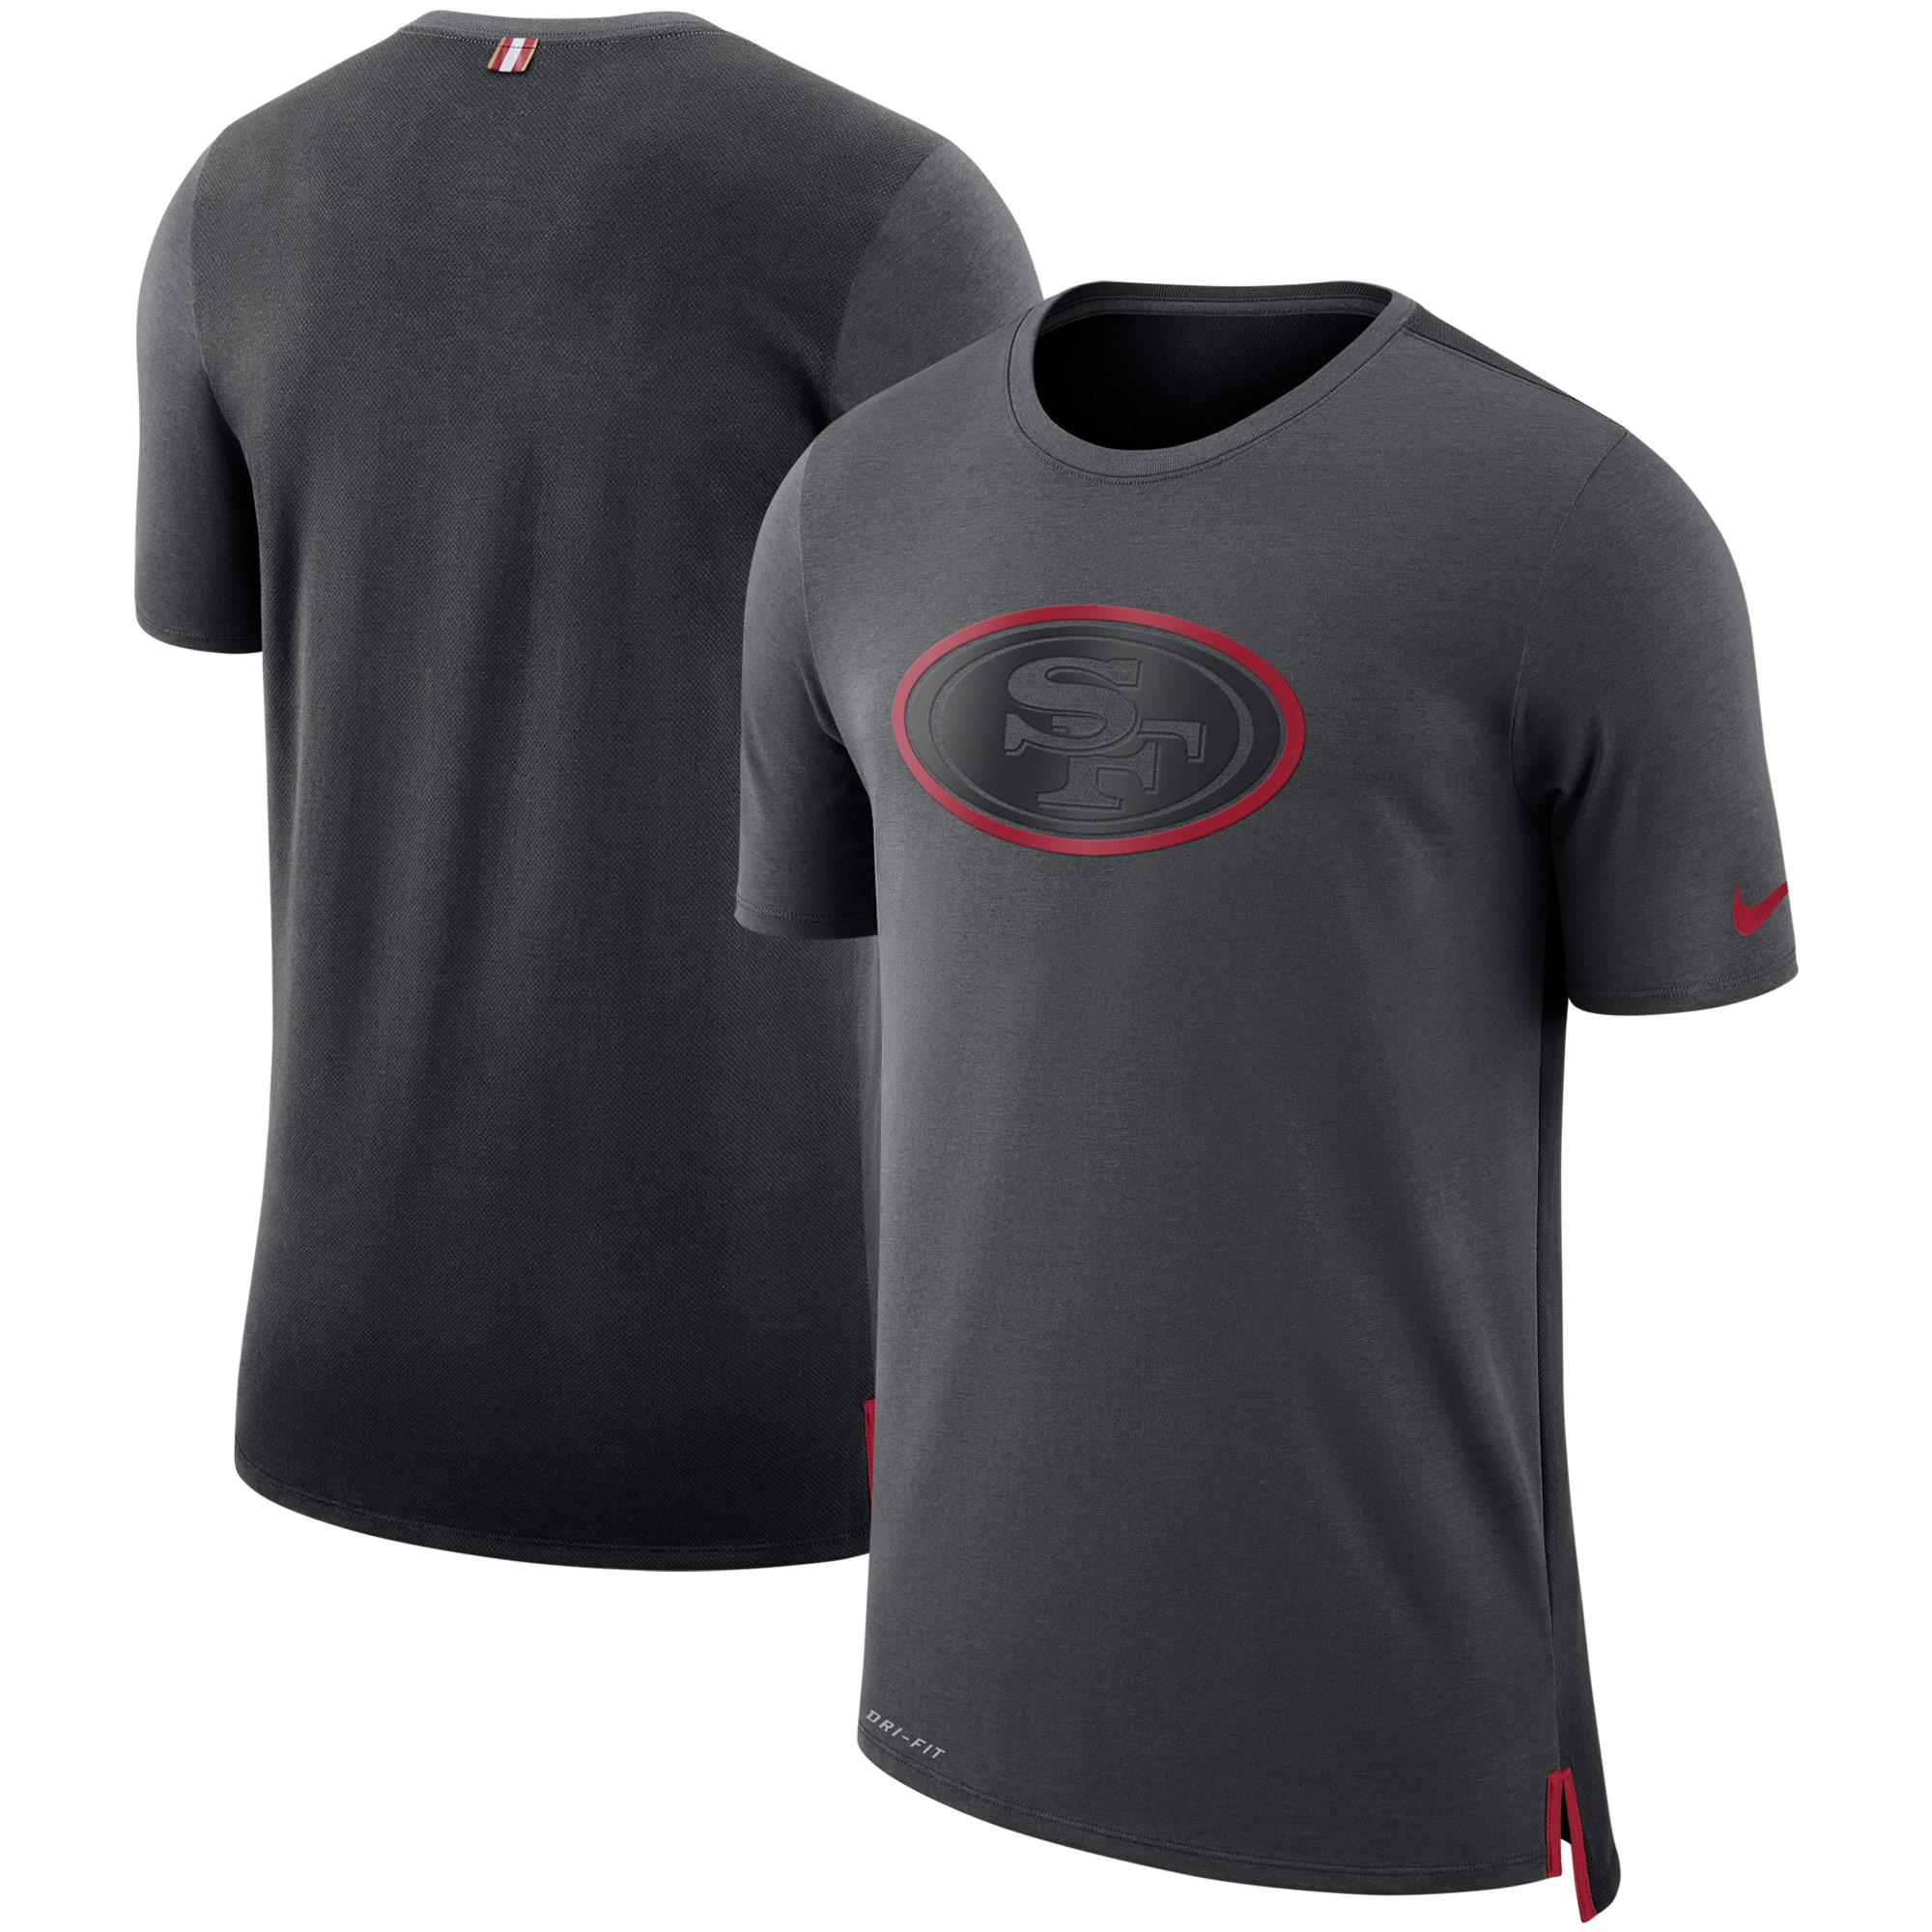 San Francisco 49ers Nike Sideline Travel Mesh Performance T-Shirt - Charcoal/Black - S